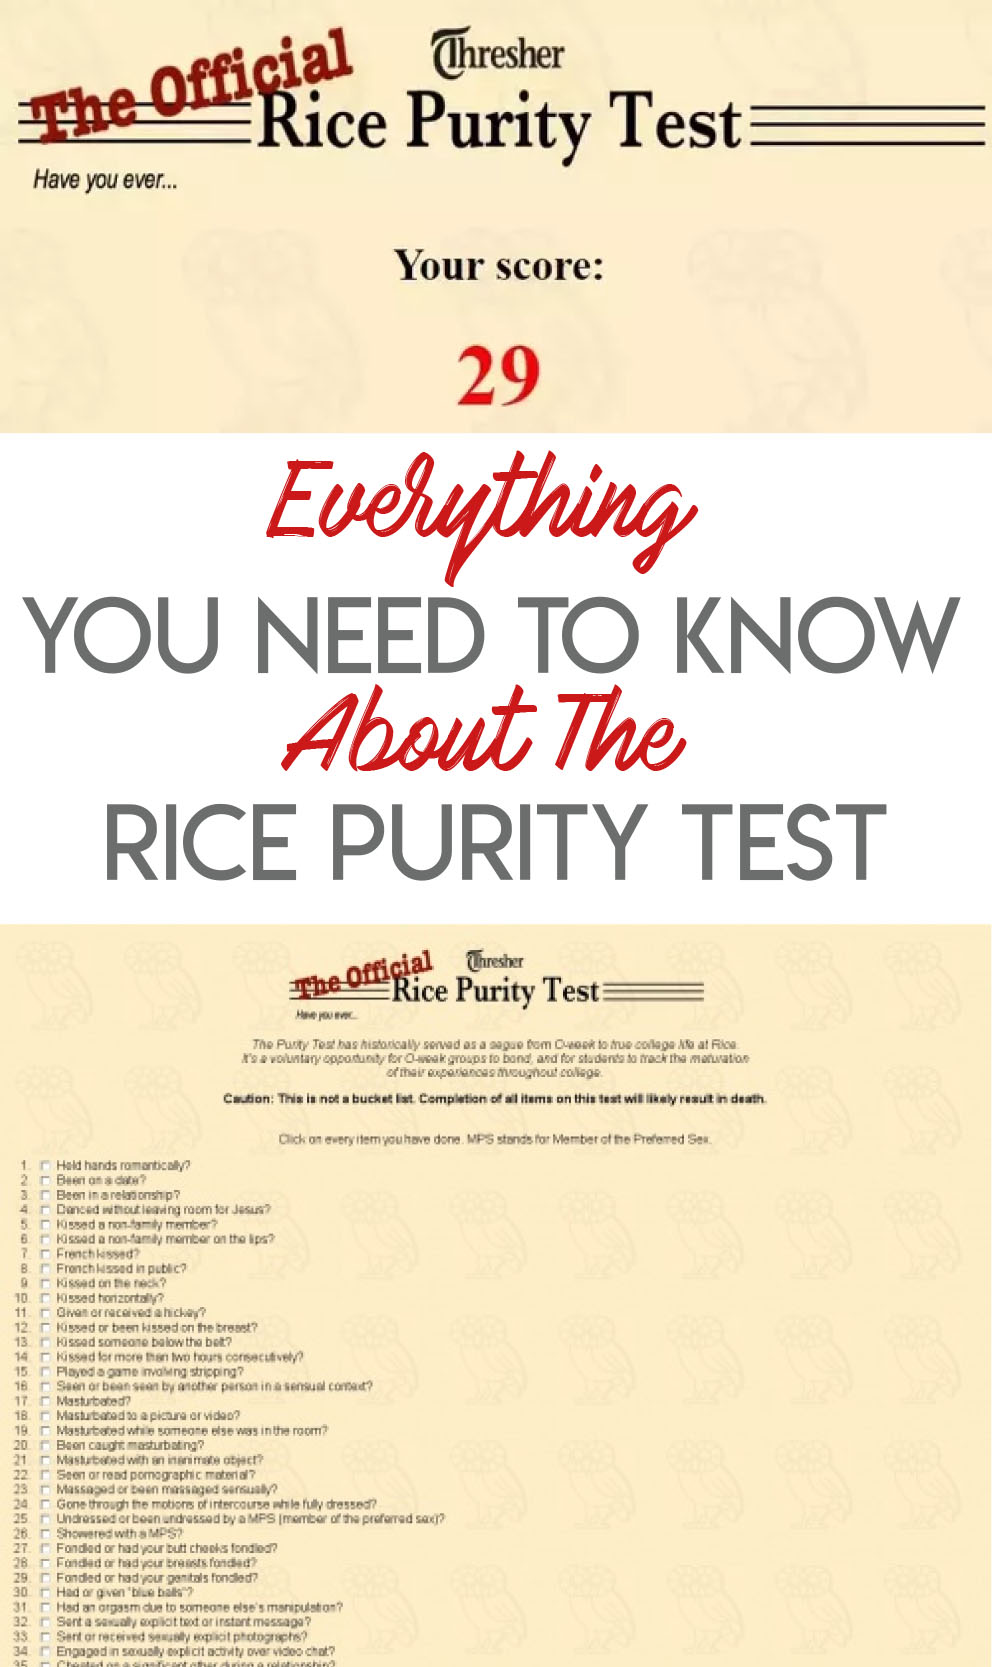 Rice purity score